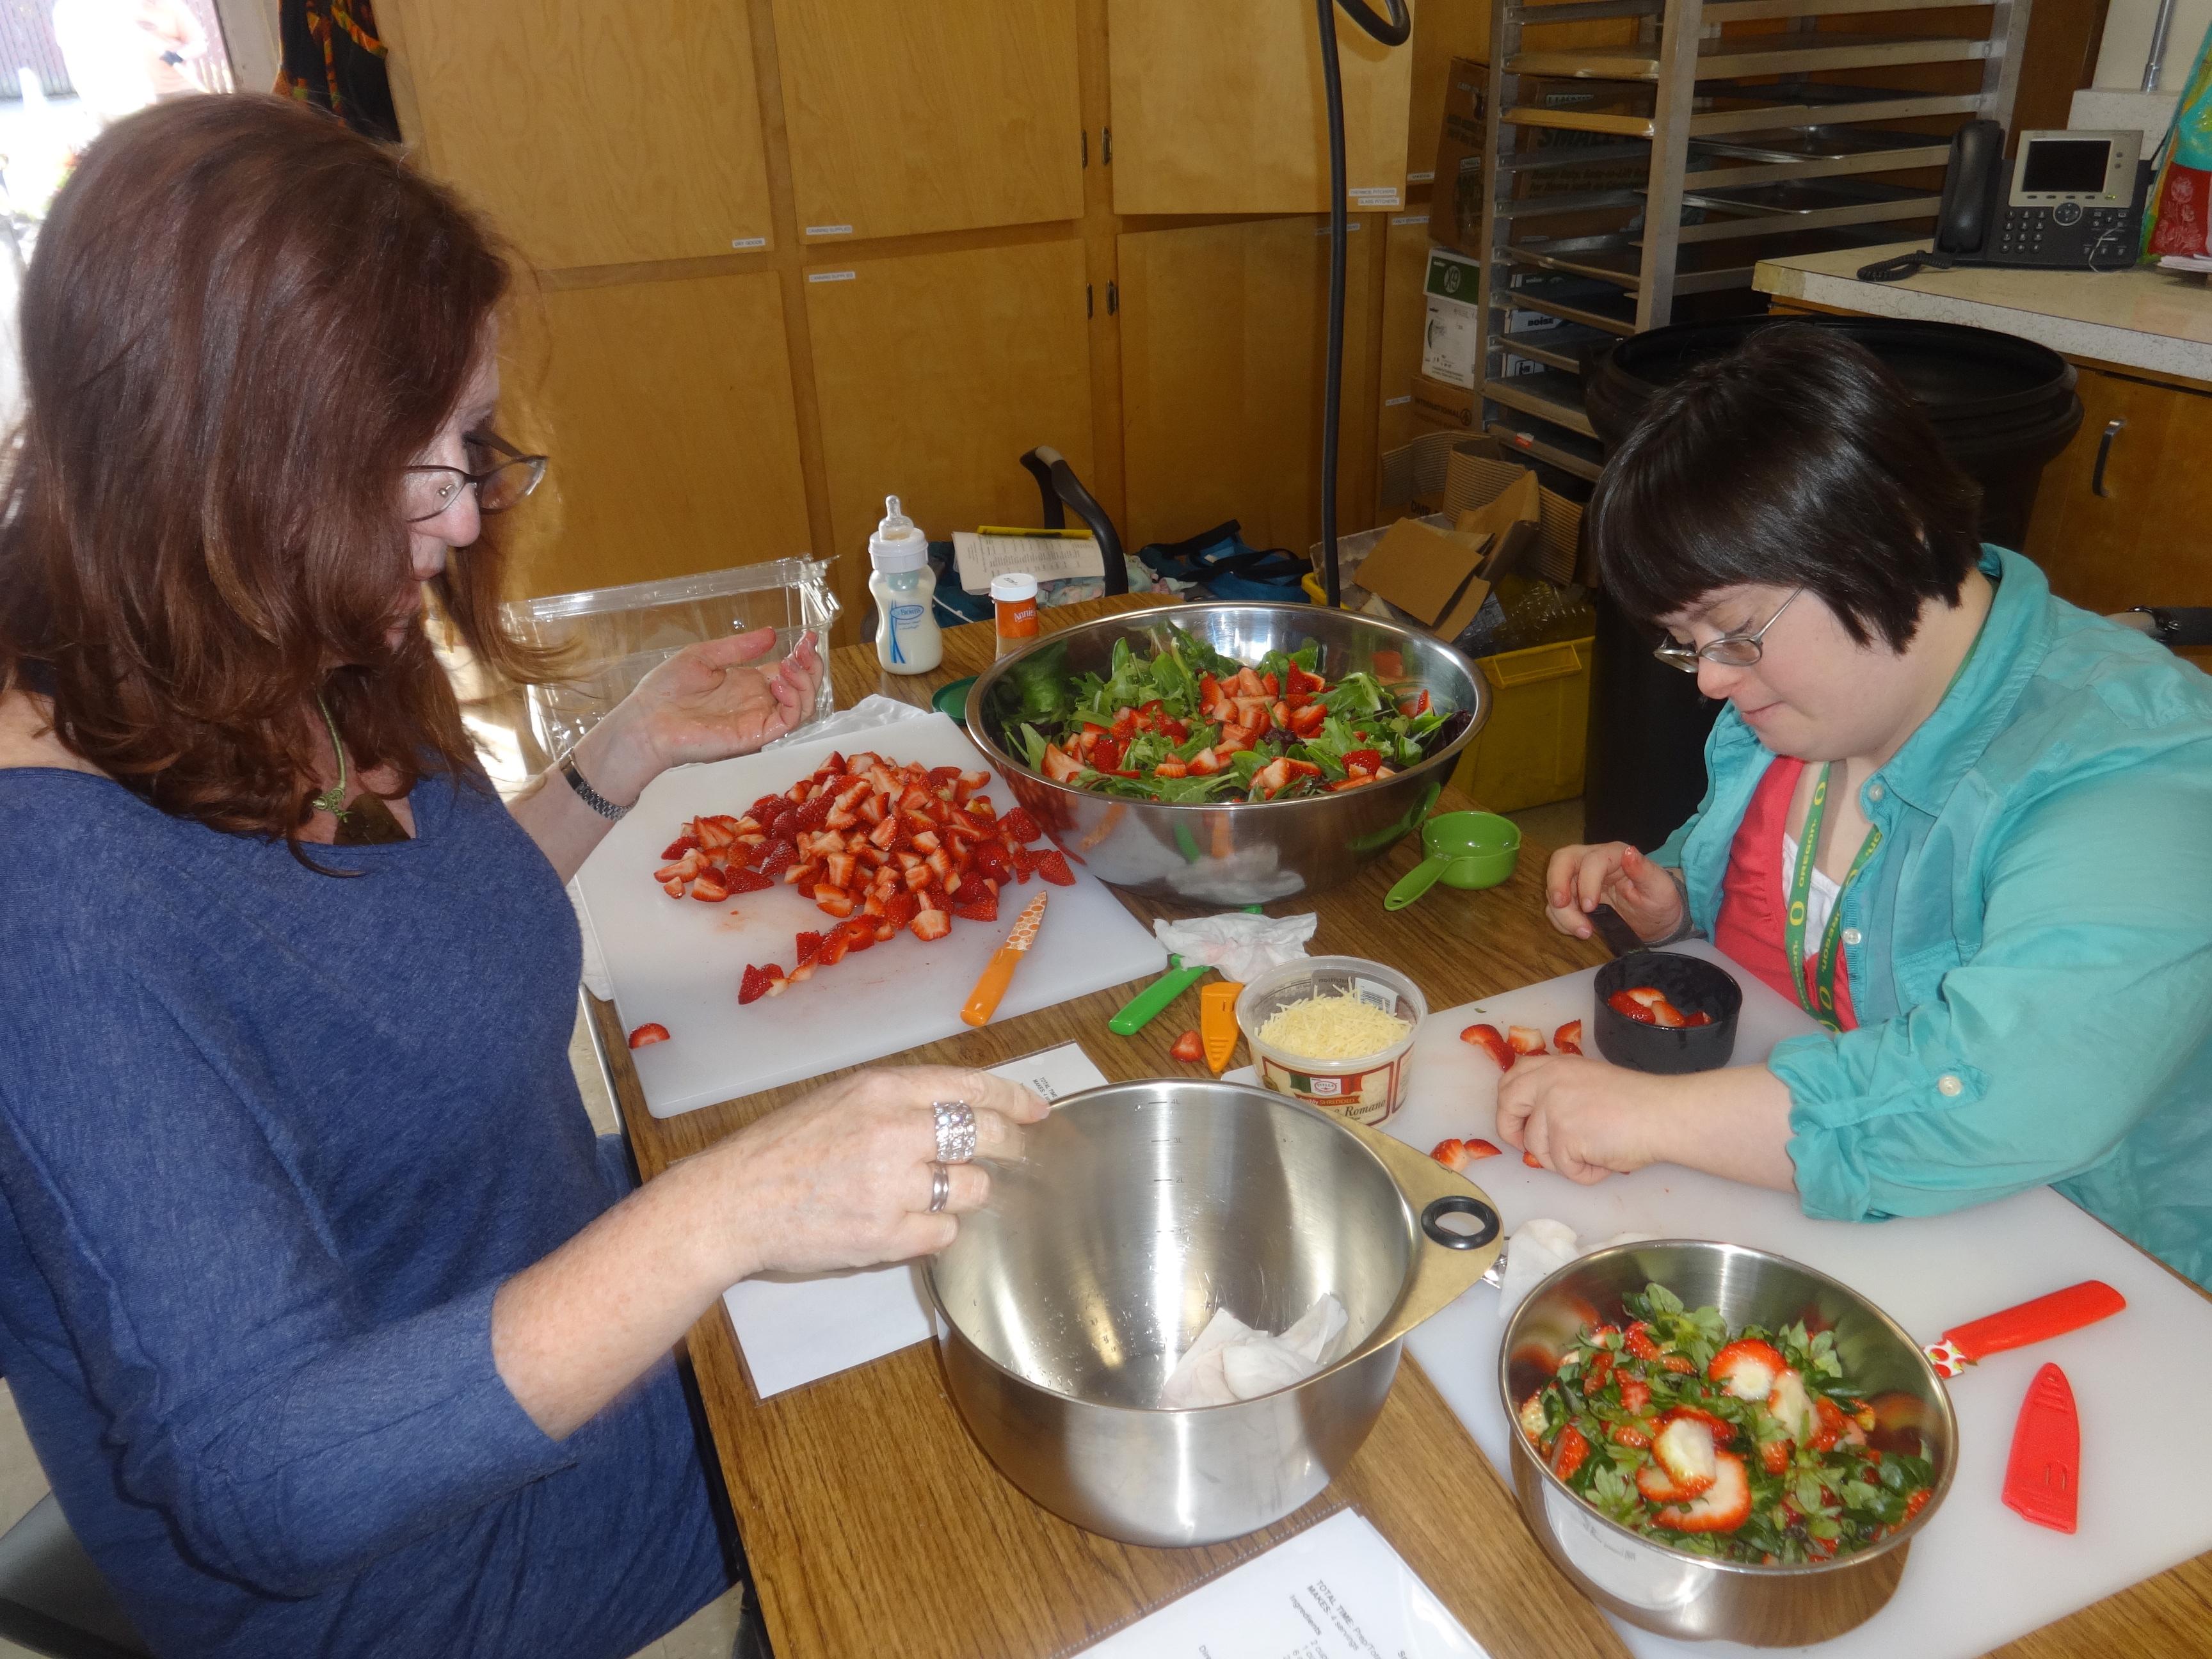 Two people making salad